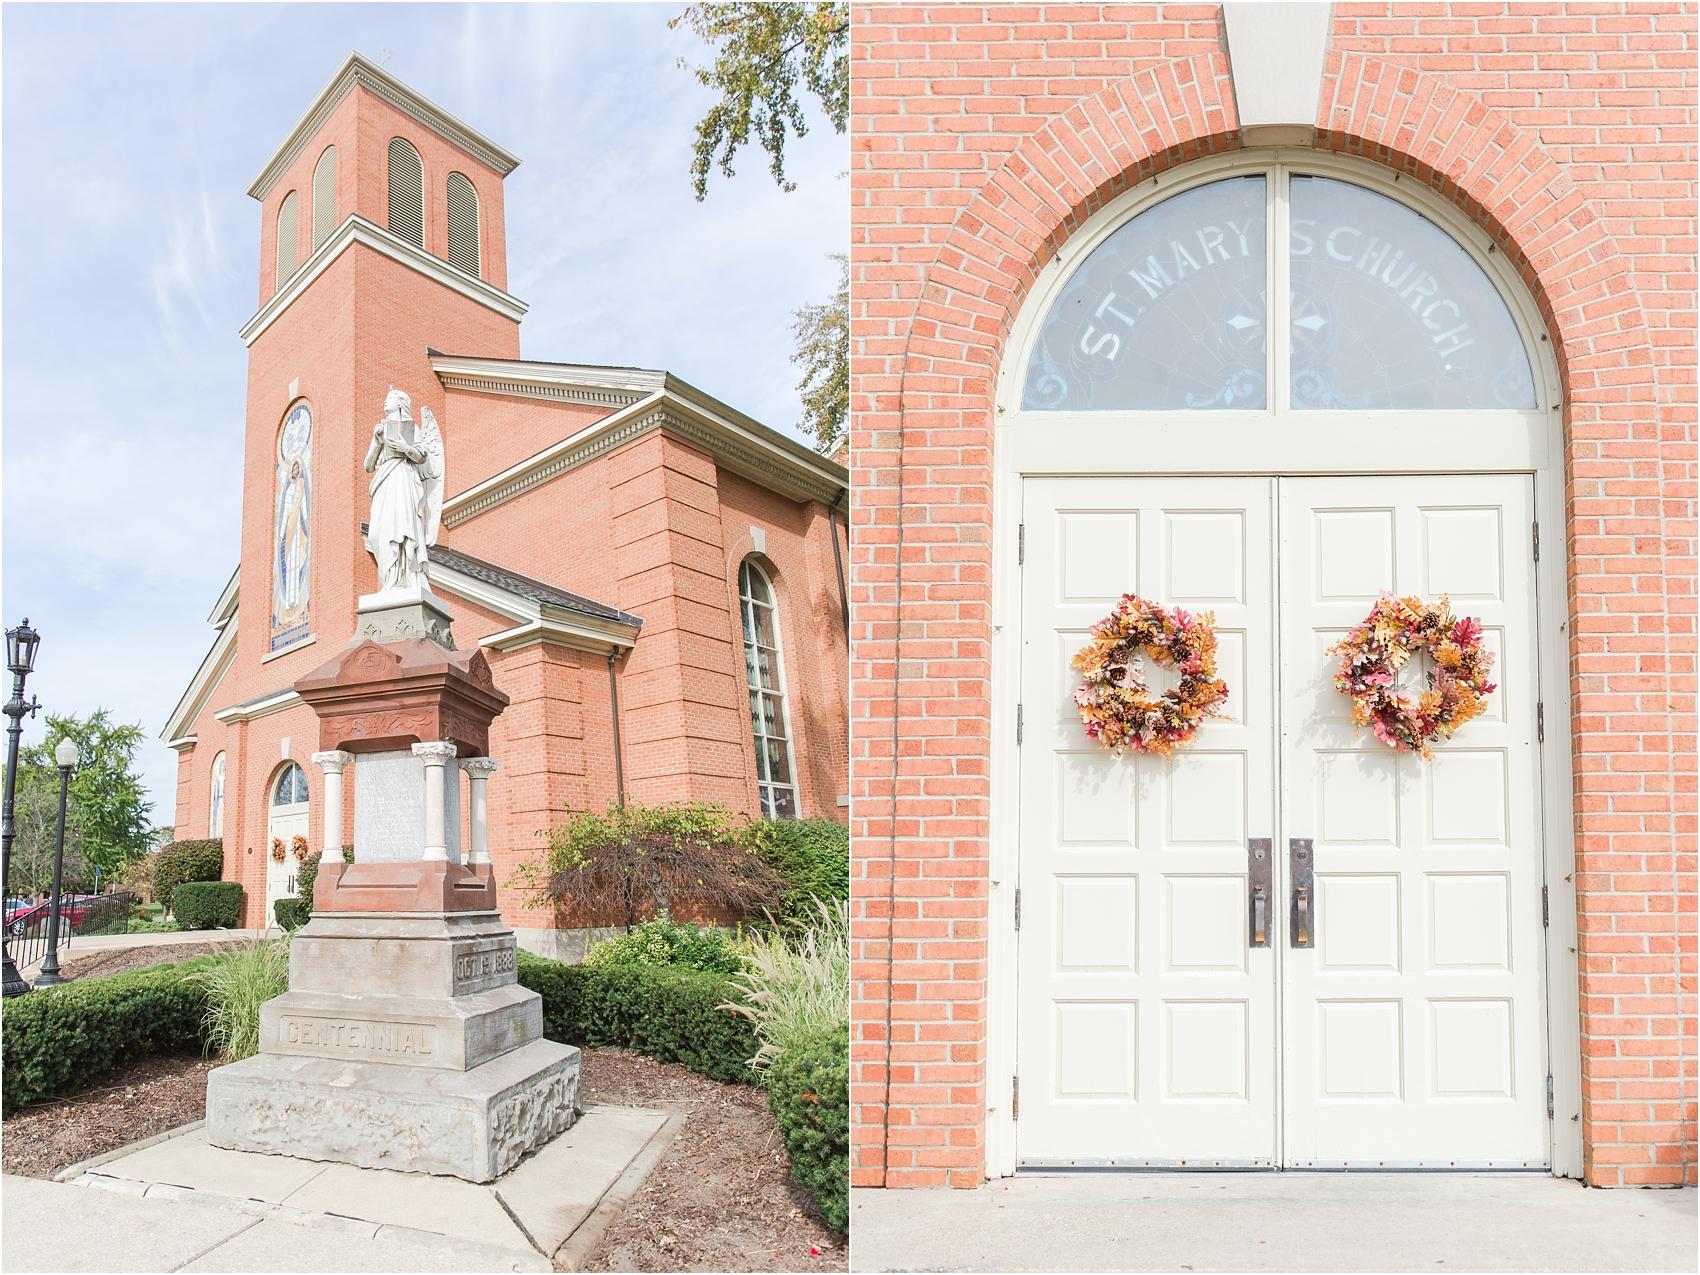 elegant-and-romantic-fall-wedding-photos-at-st-marys-catholic-church-in-monroe-michigan-by-courtney-carolyn-photography_0012.jpg